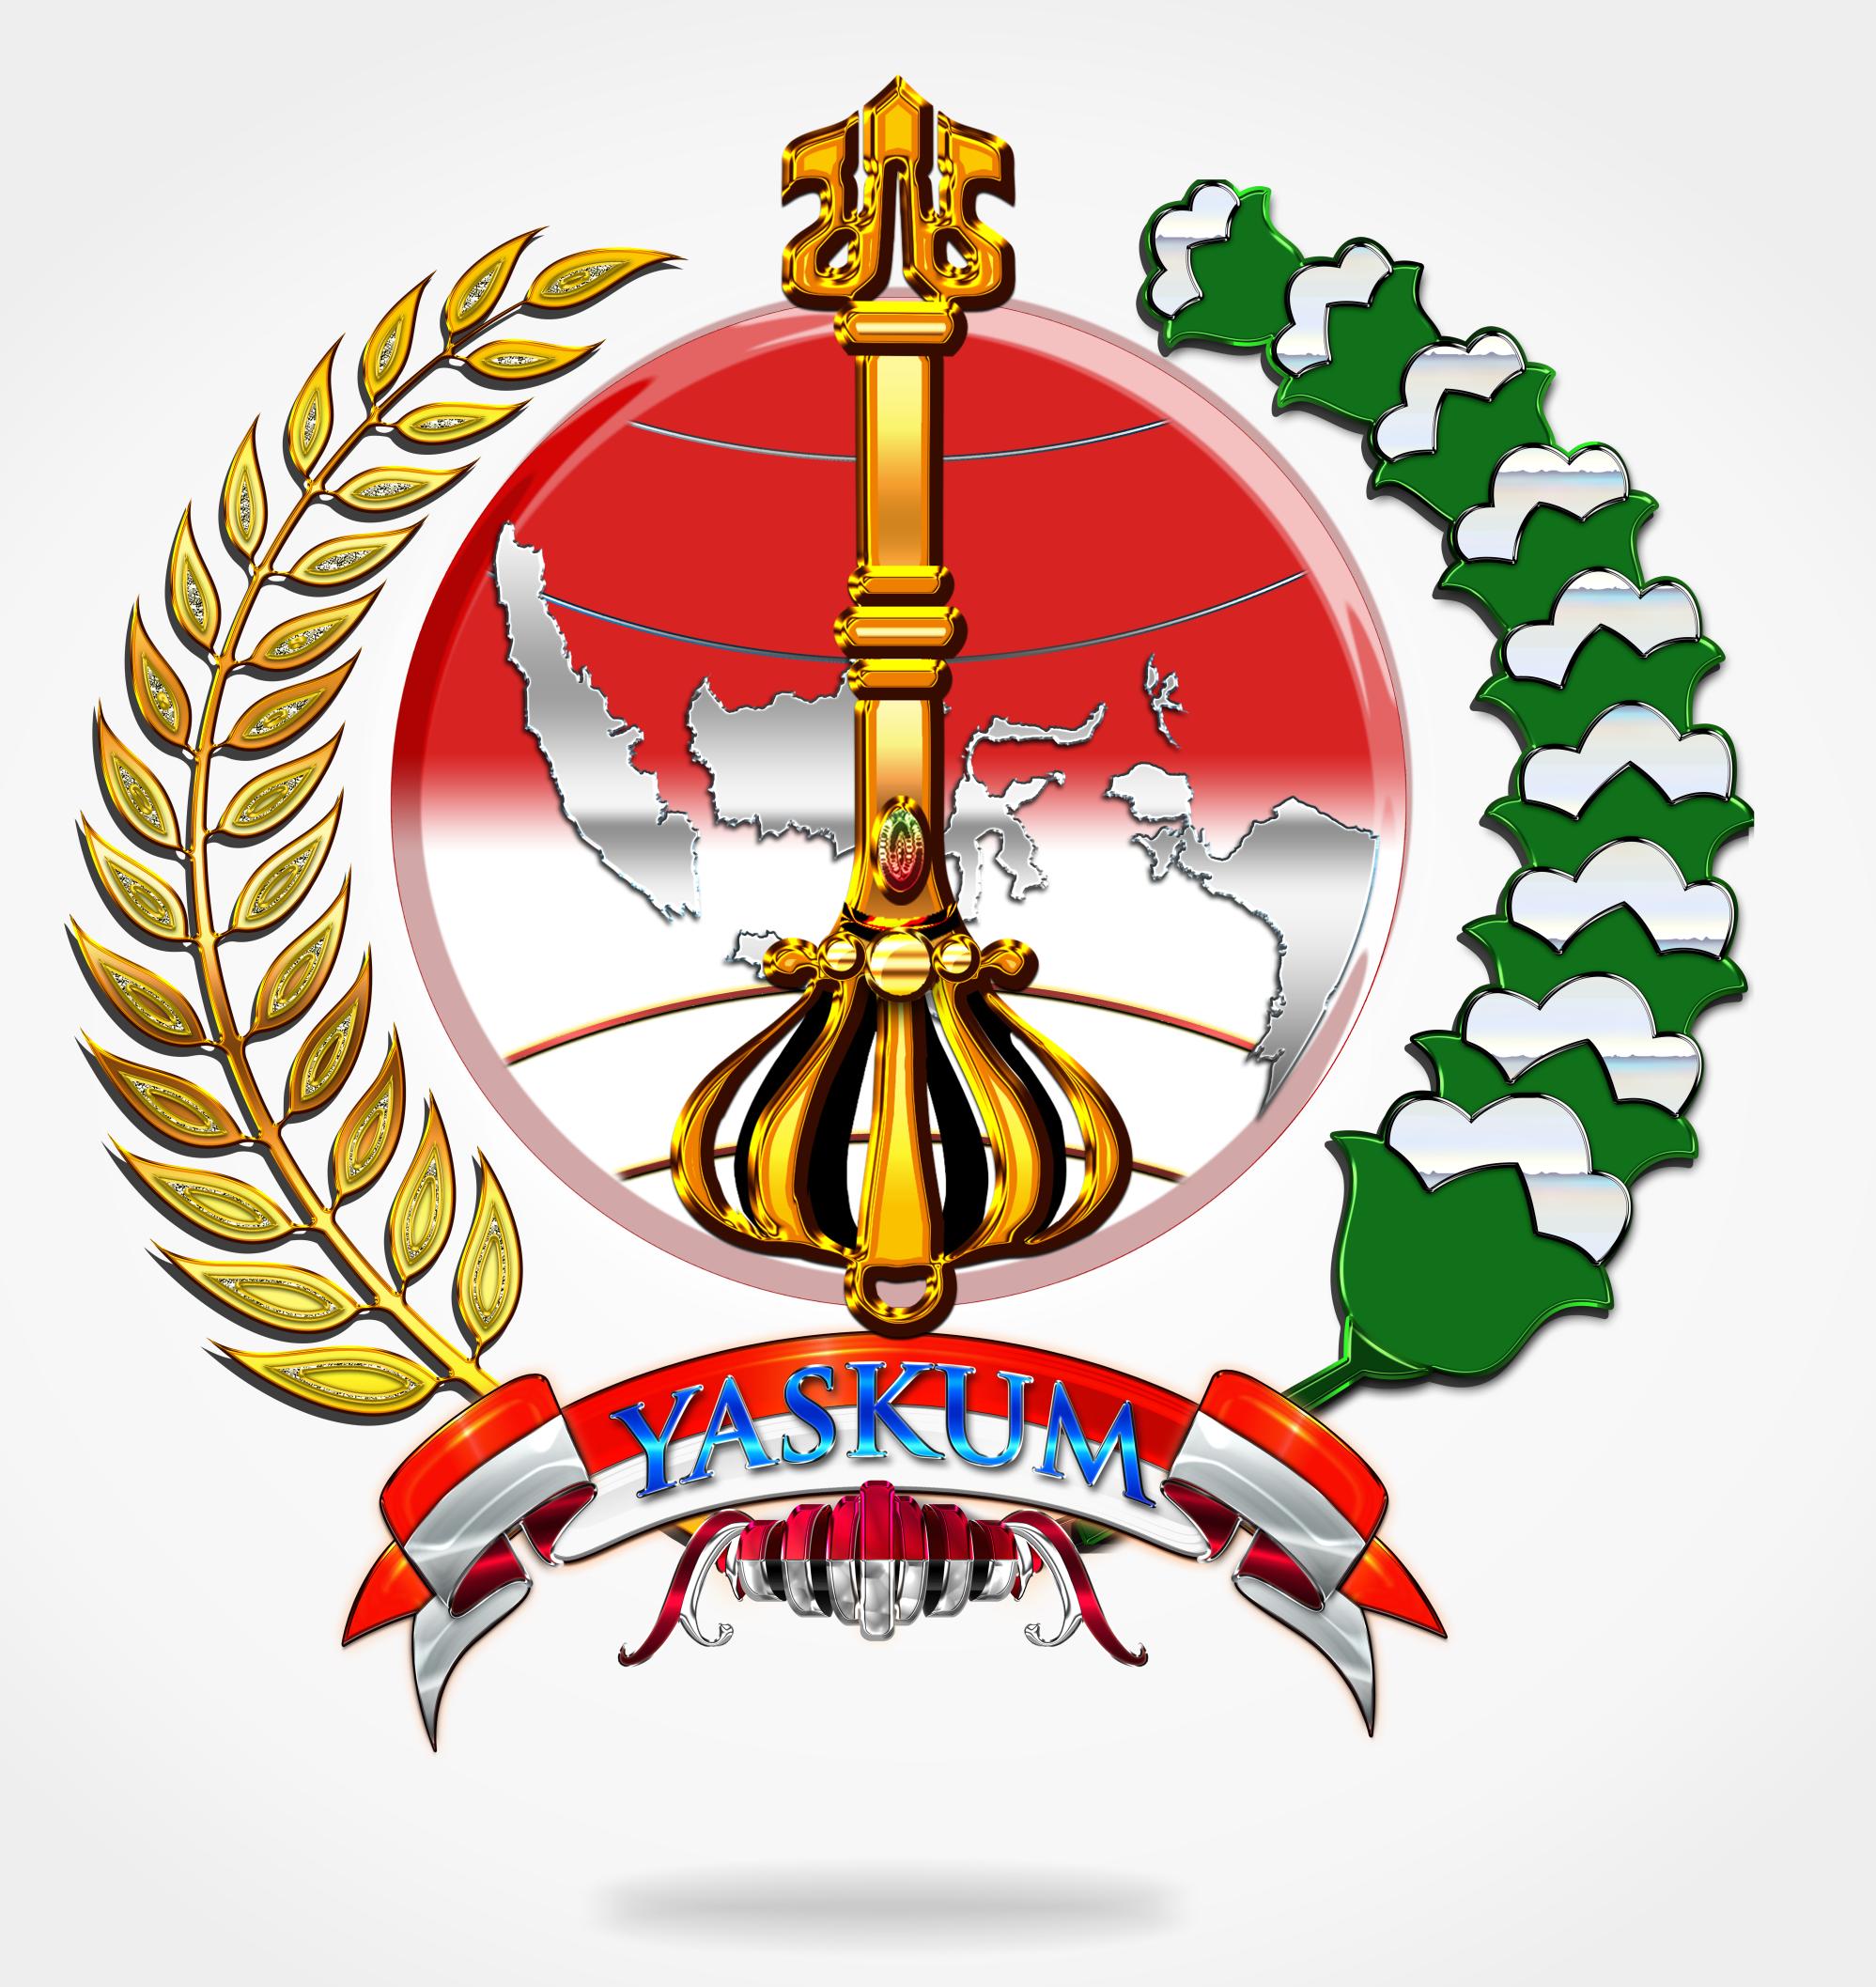 Logo Yaskum Indonesia Indonesia Desain Hantu